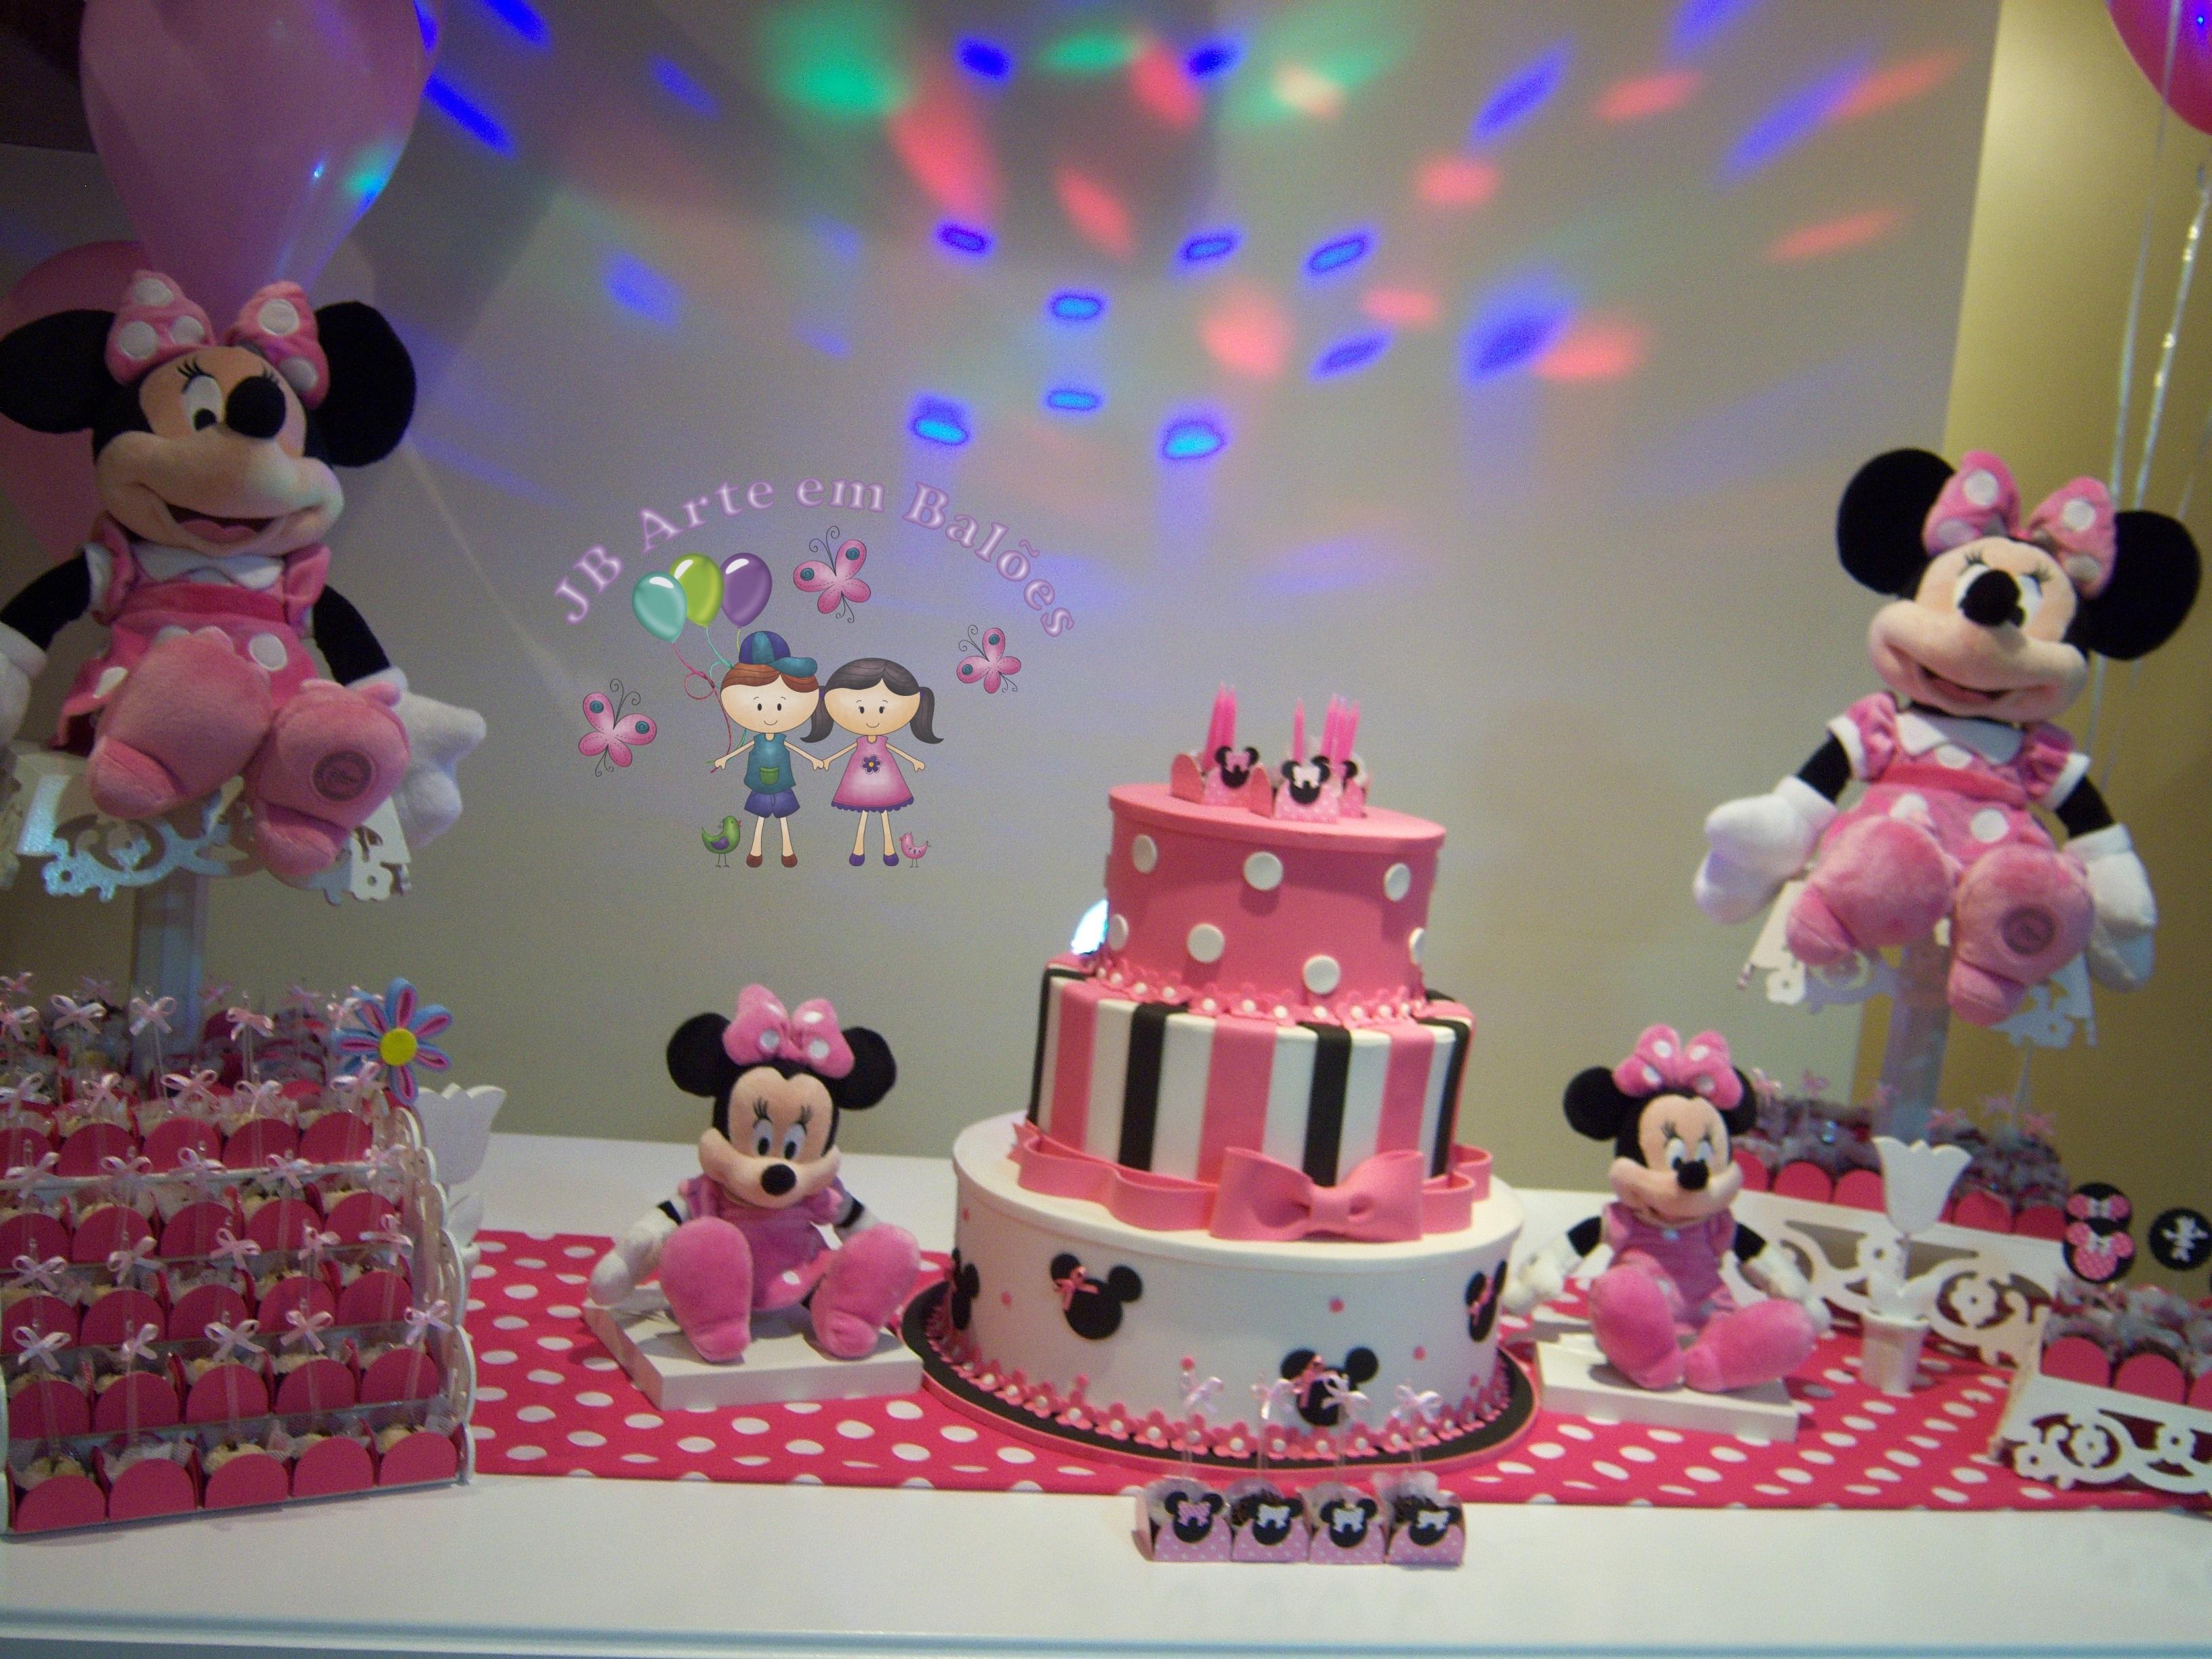 decoracao festa minnie rosa : decoracao festa minnie rosa:Decoração Minnie Rosa com Mesa Provençal Decoração Minnie Rosa